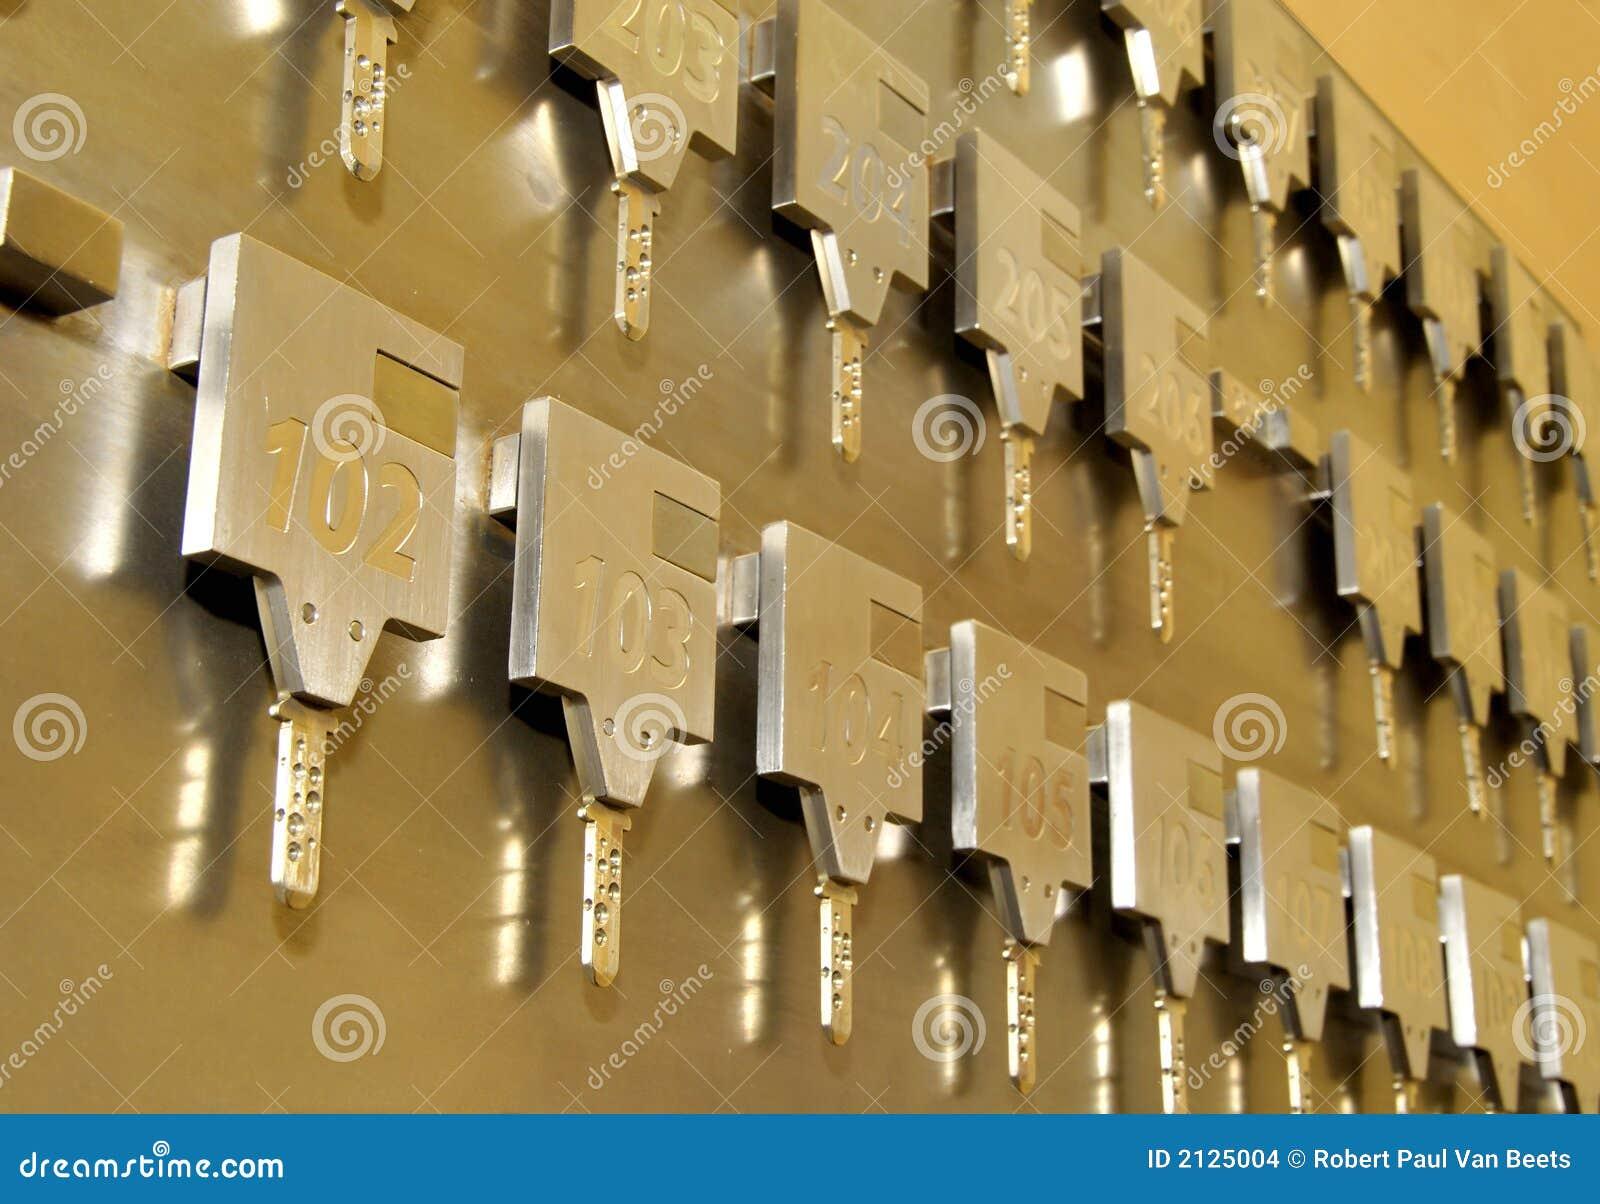 Hotel room keys stock photo  Image of safety, lobby, safe